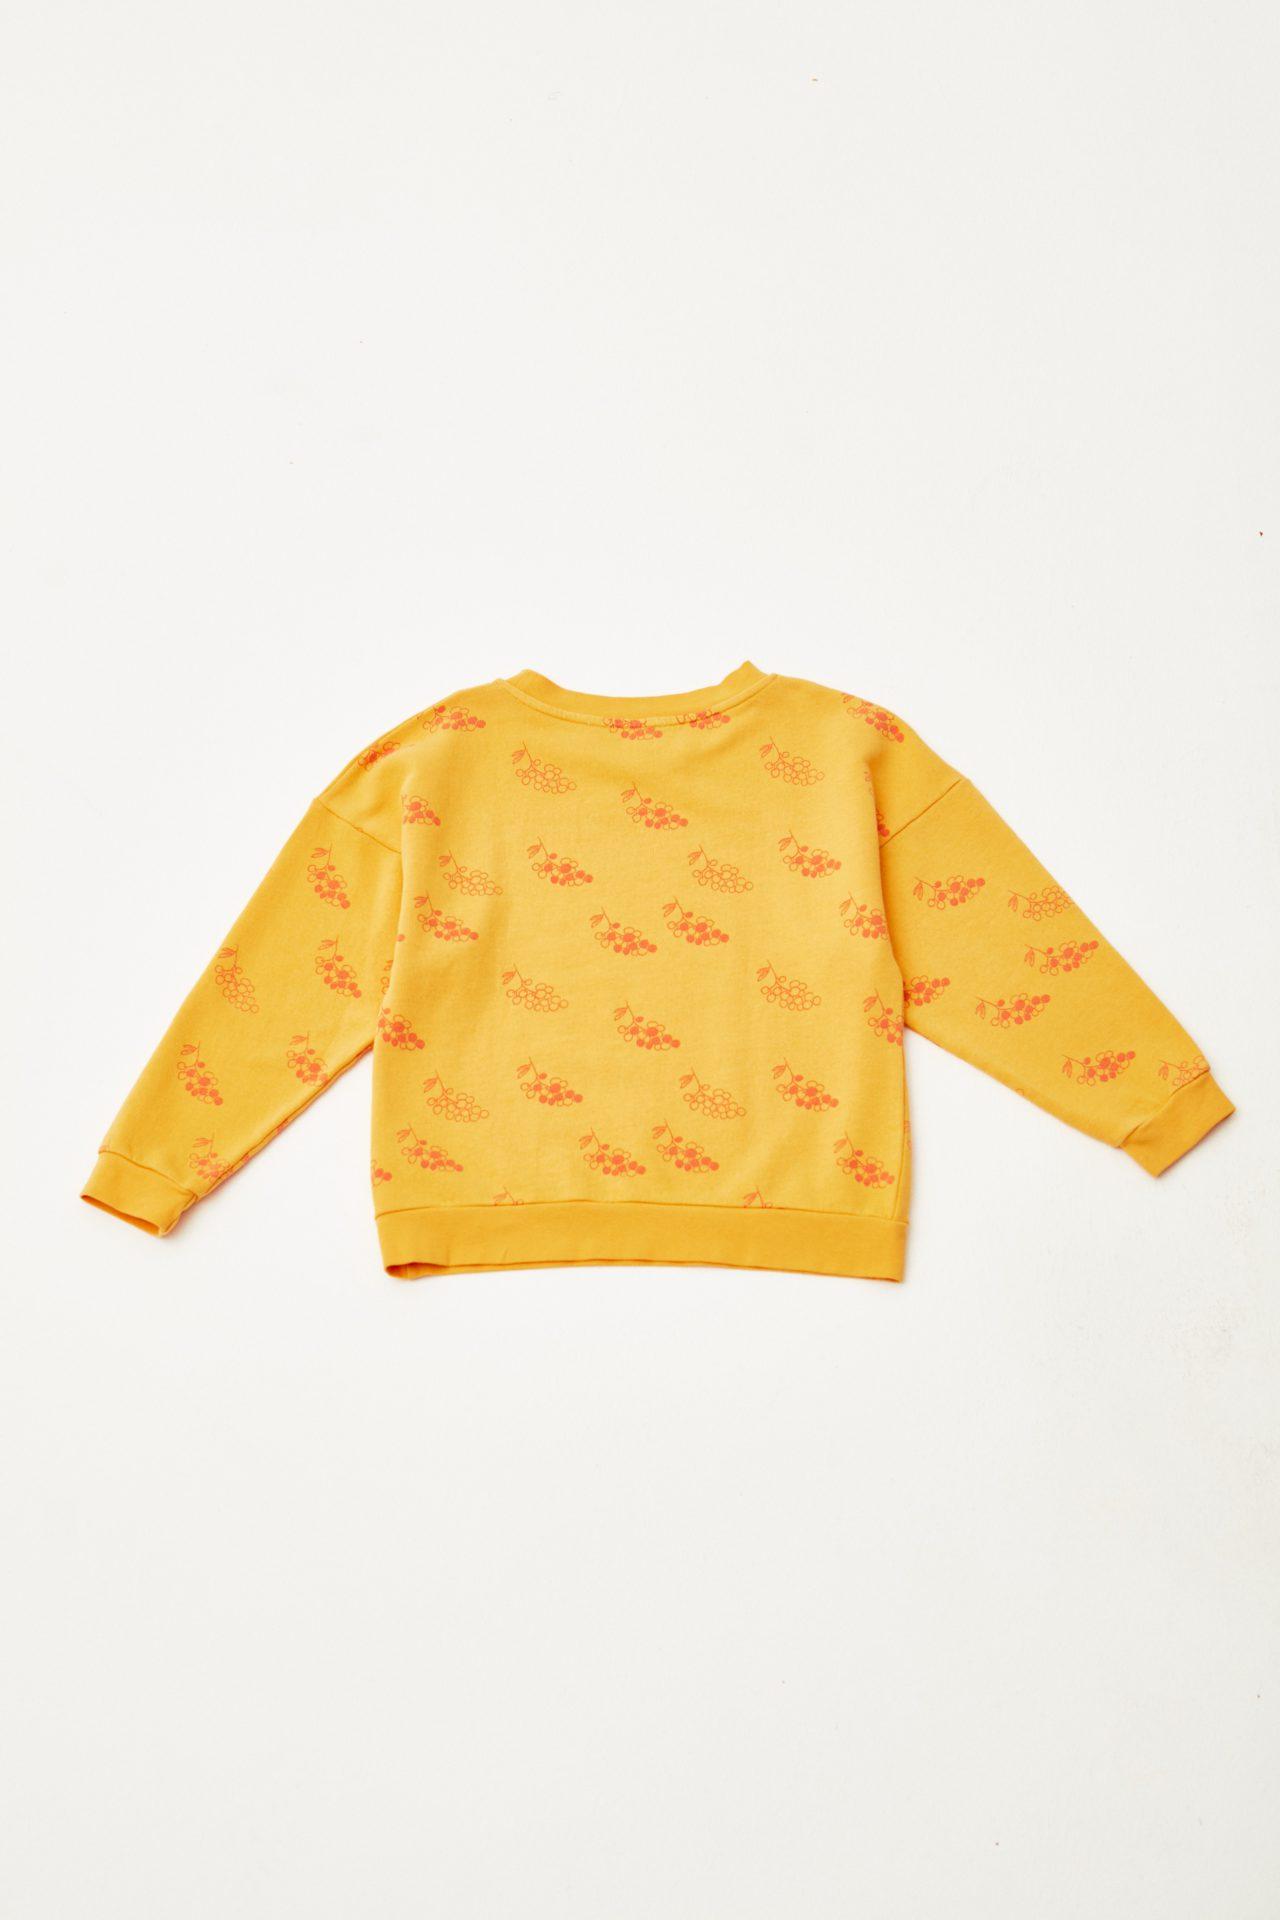 Grapes Sweatshirt back